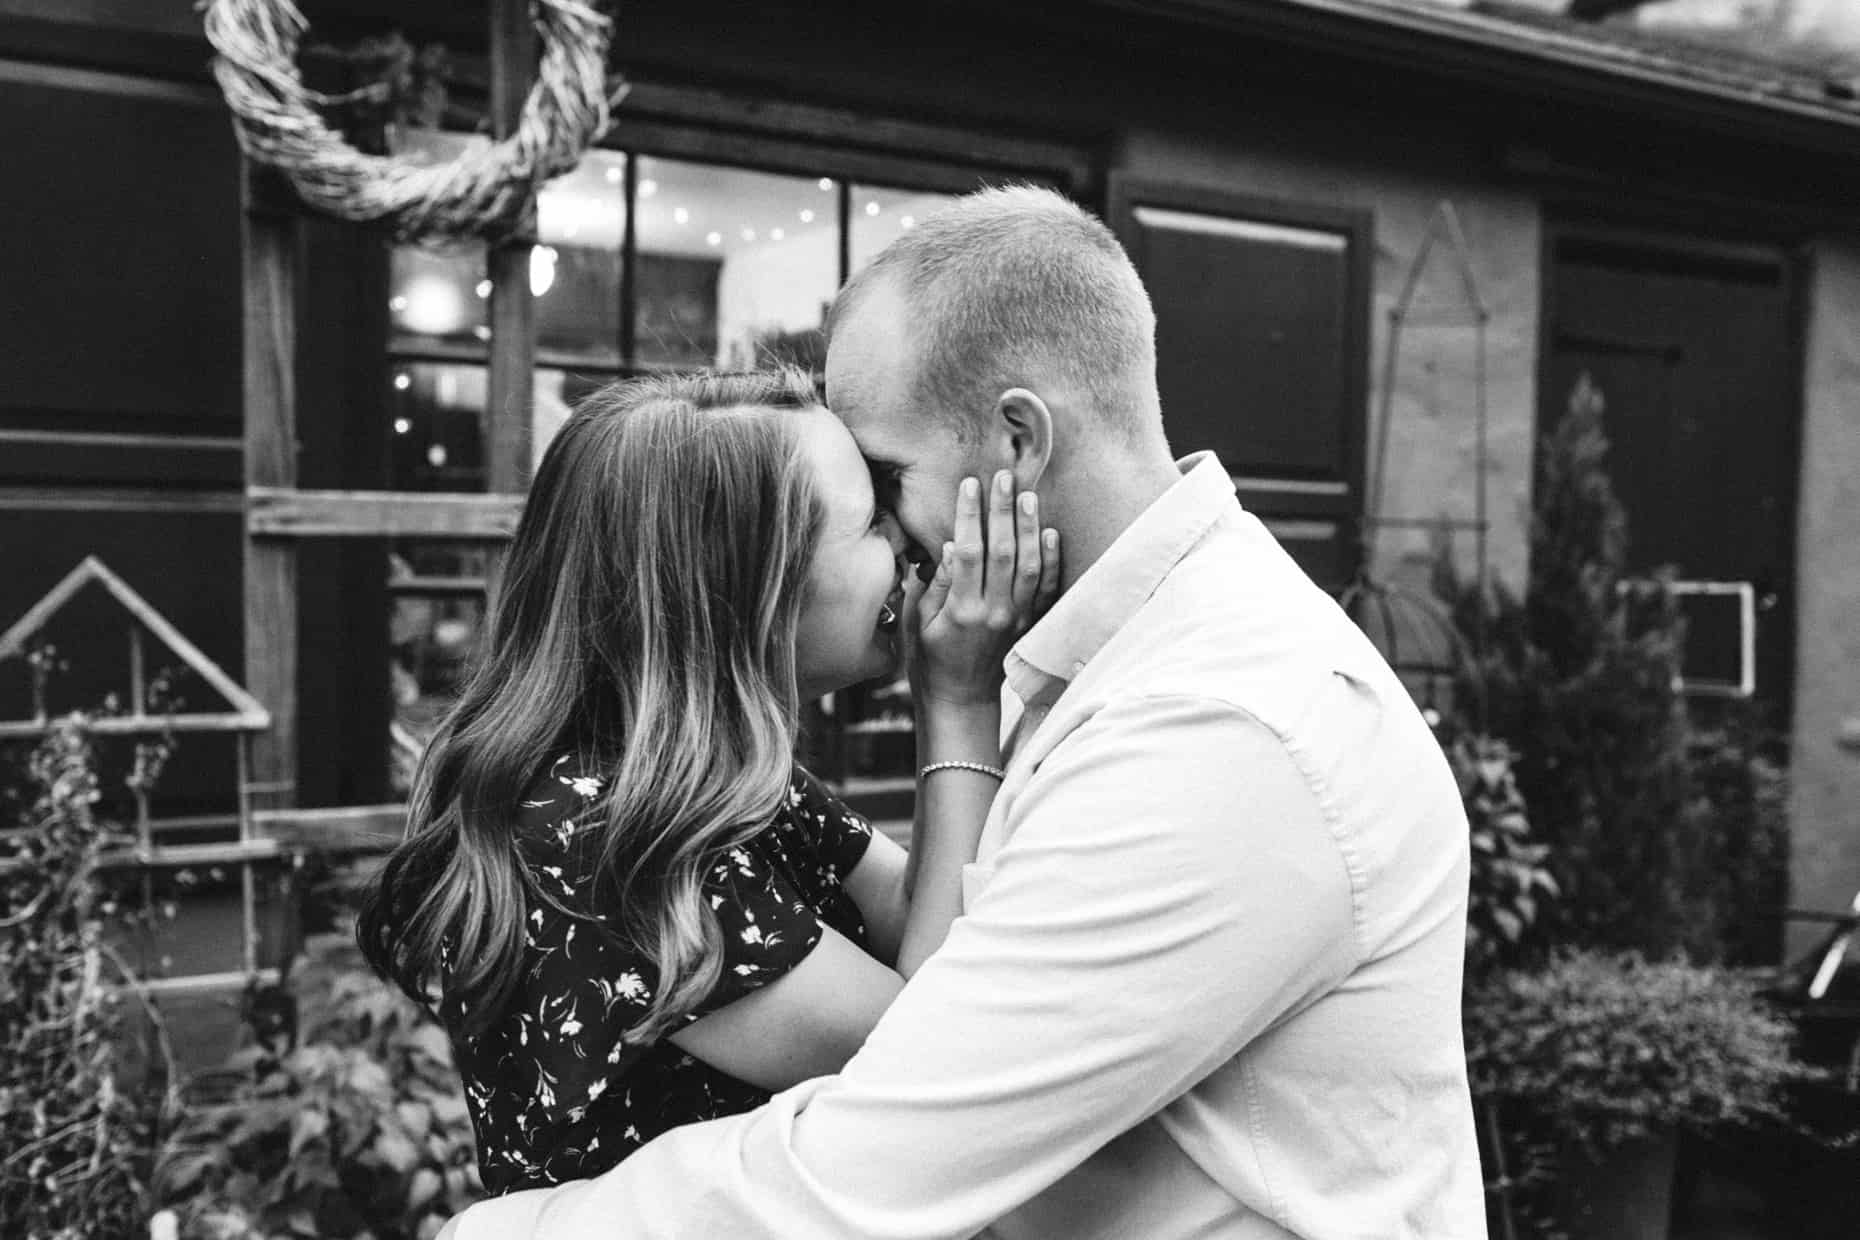 Engagement photographers Chestnut Hill